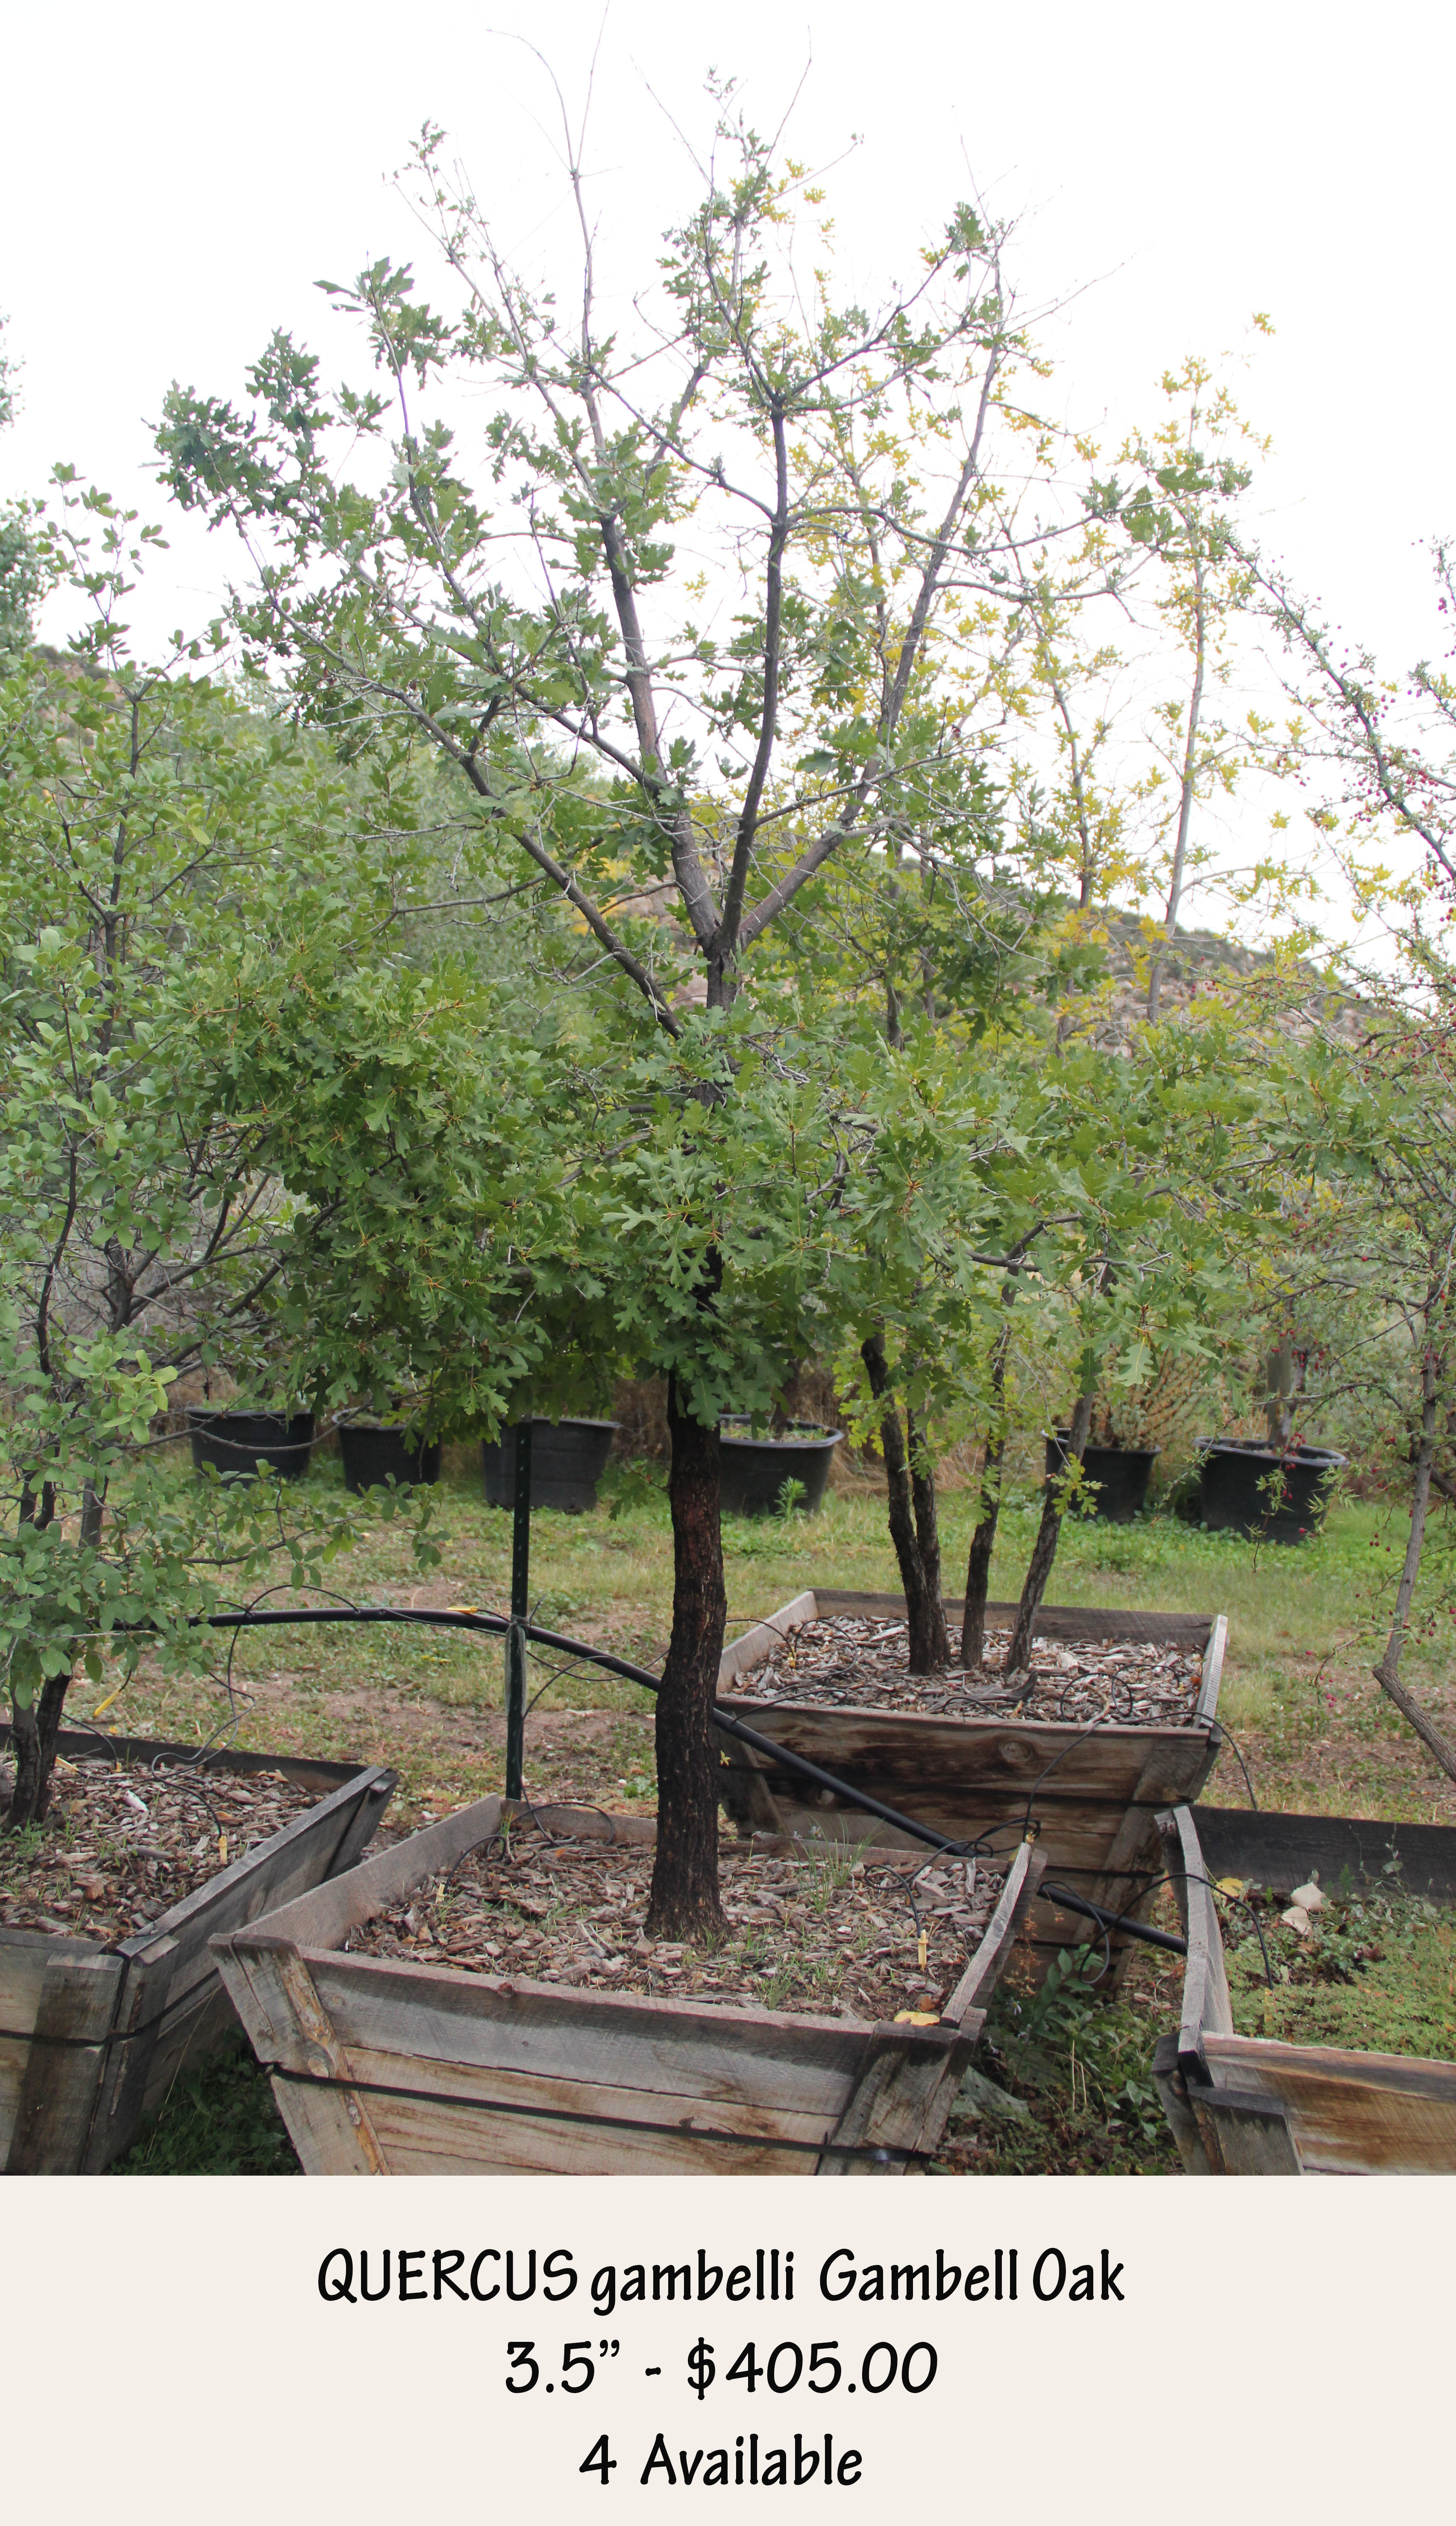 Gambell Oak